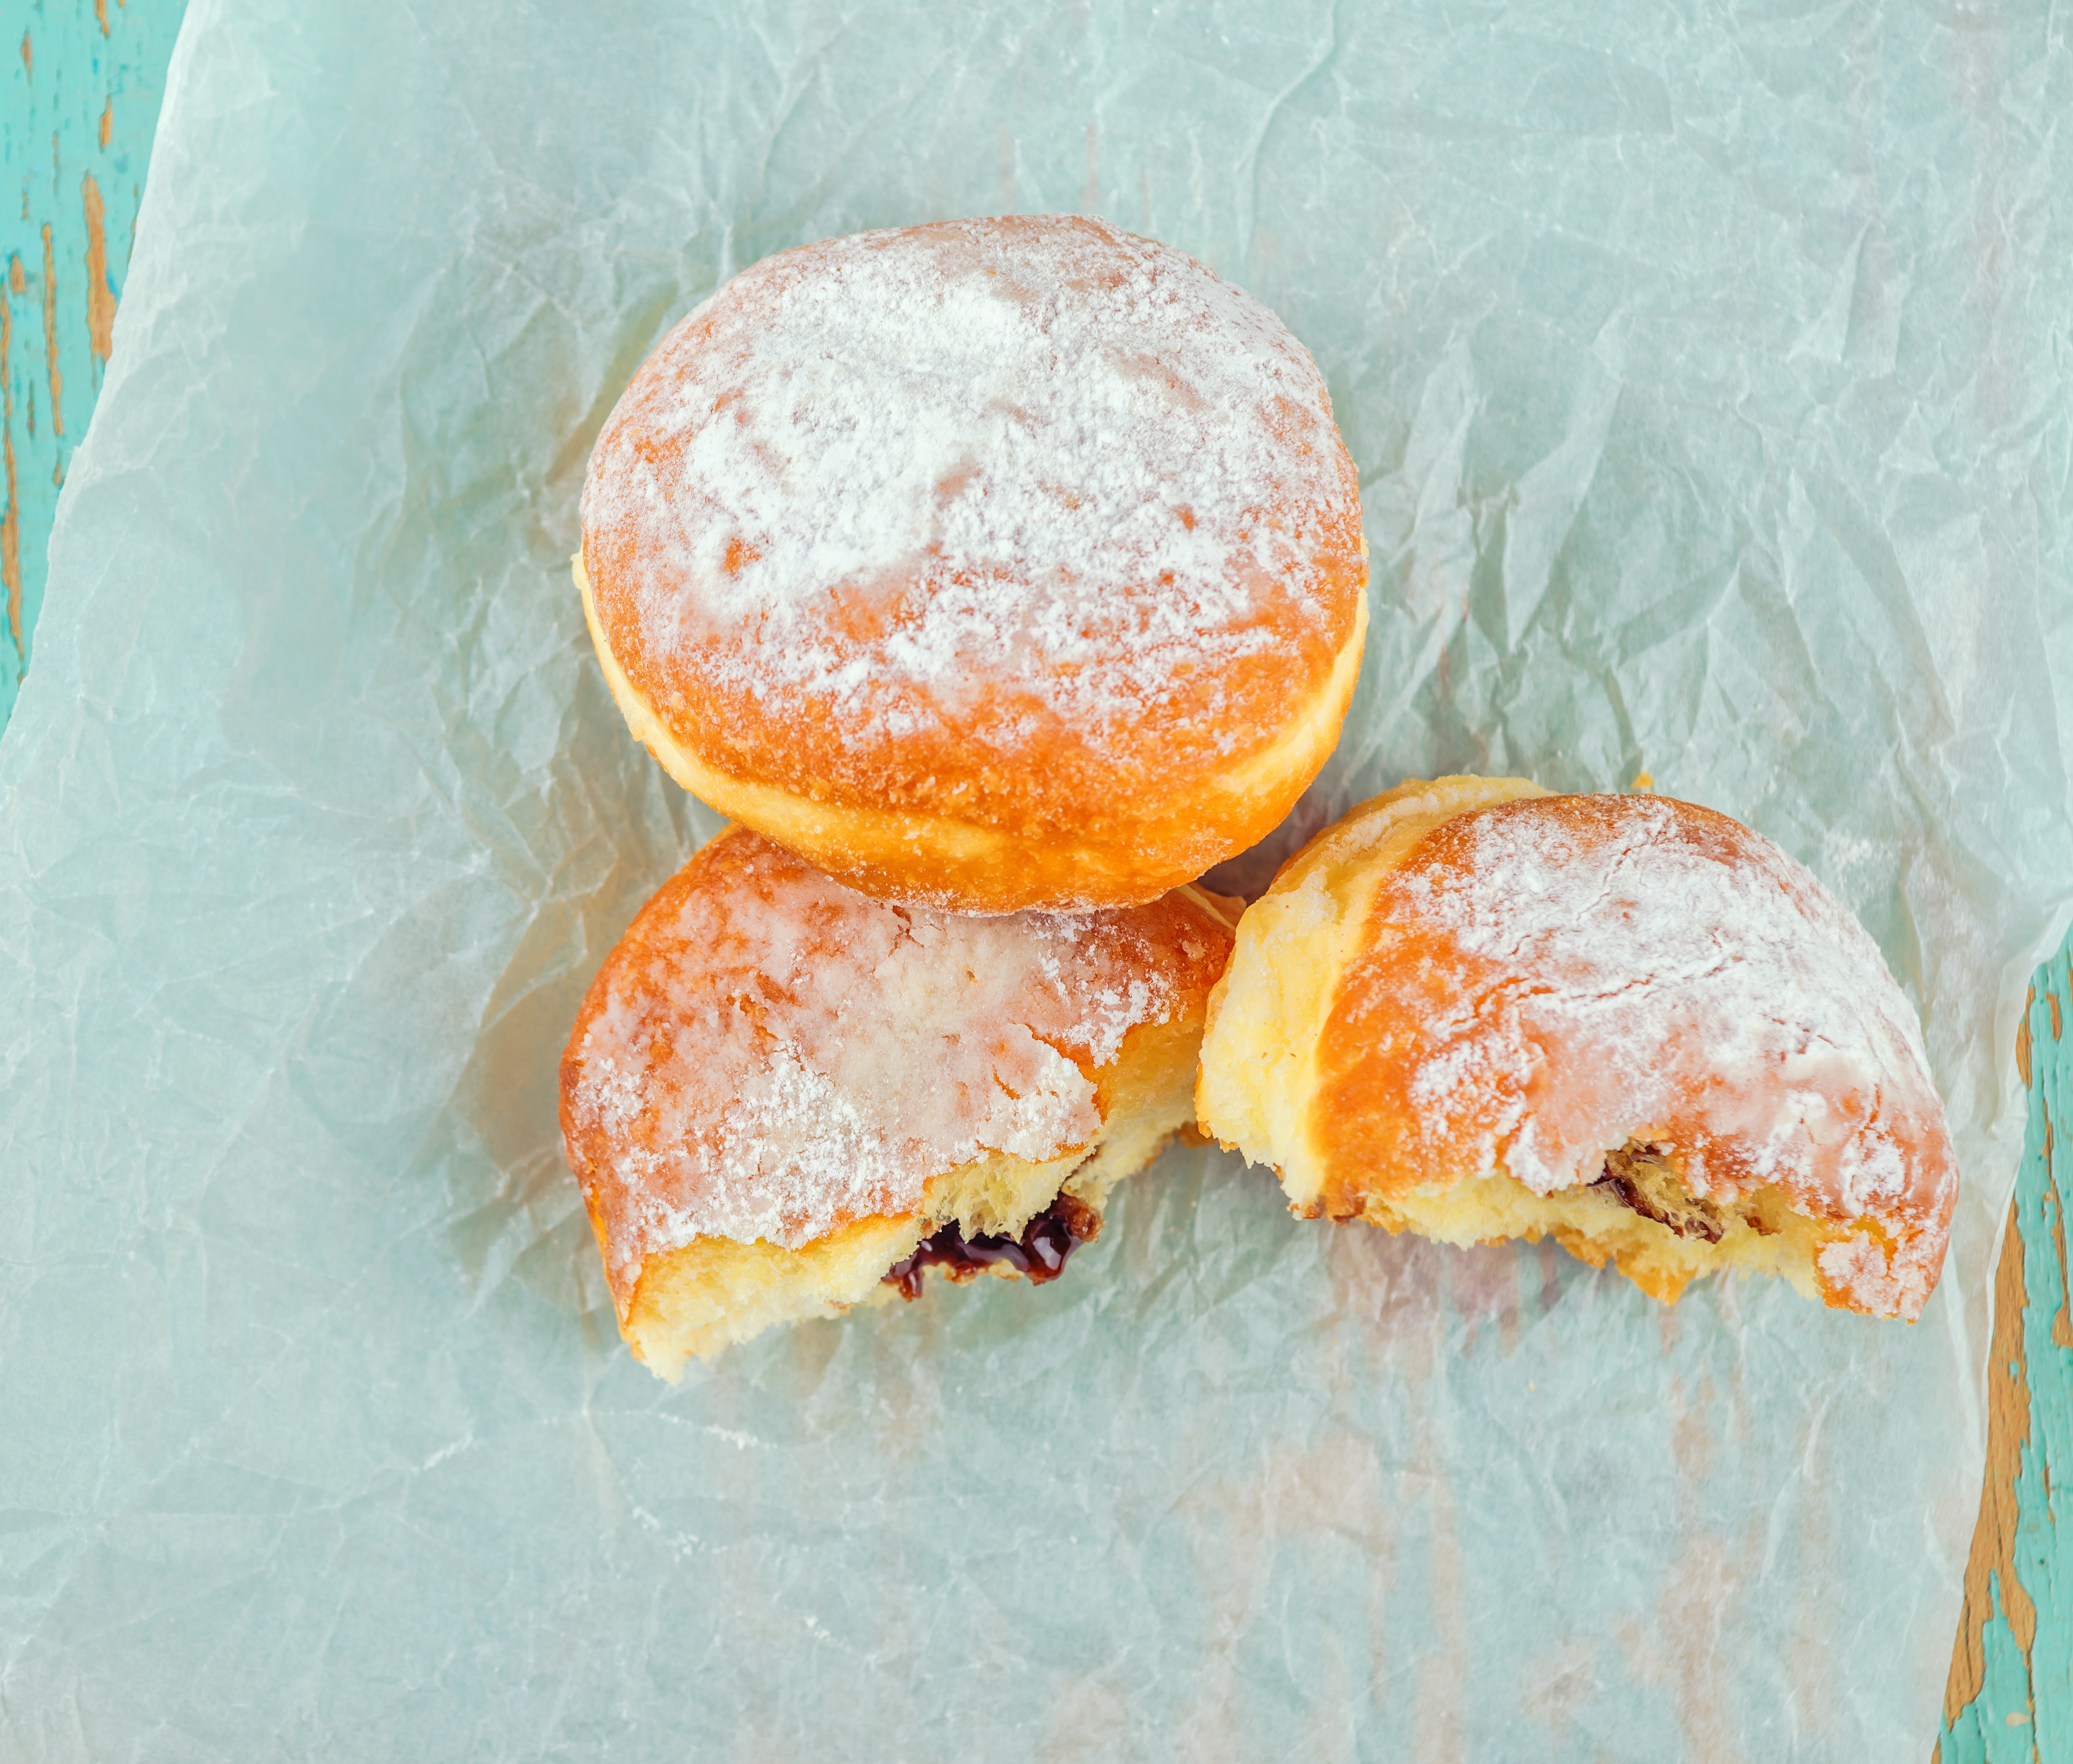 Baked Sufganiyot (Jelly Doughnuts)